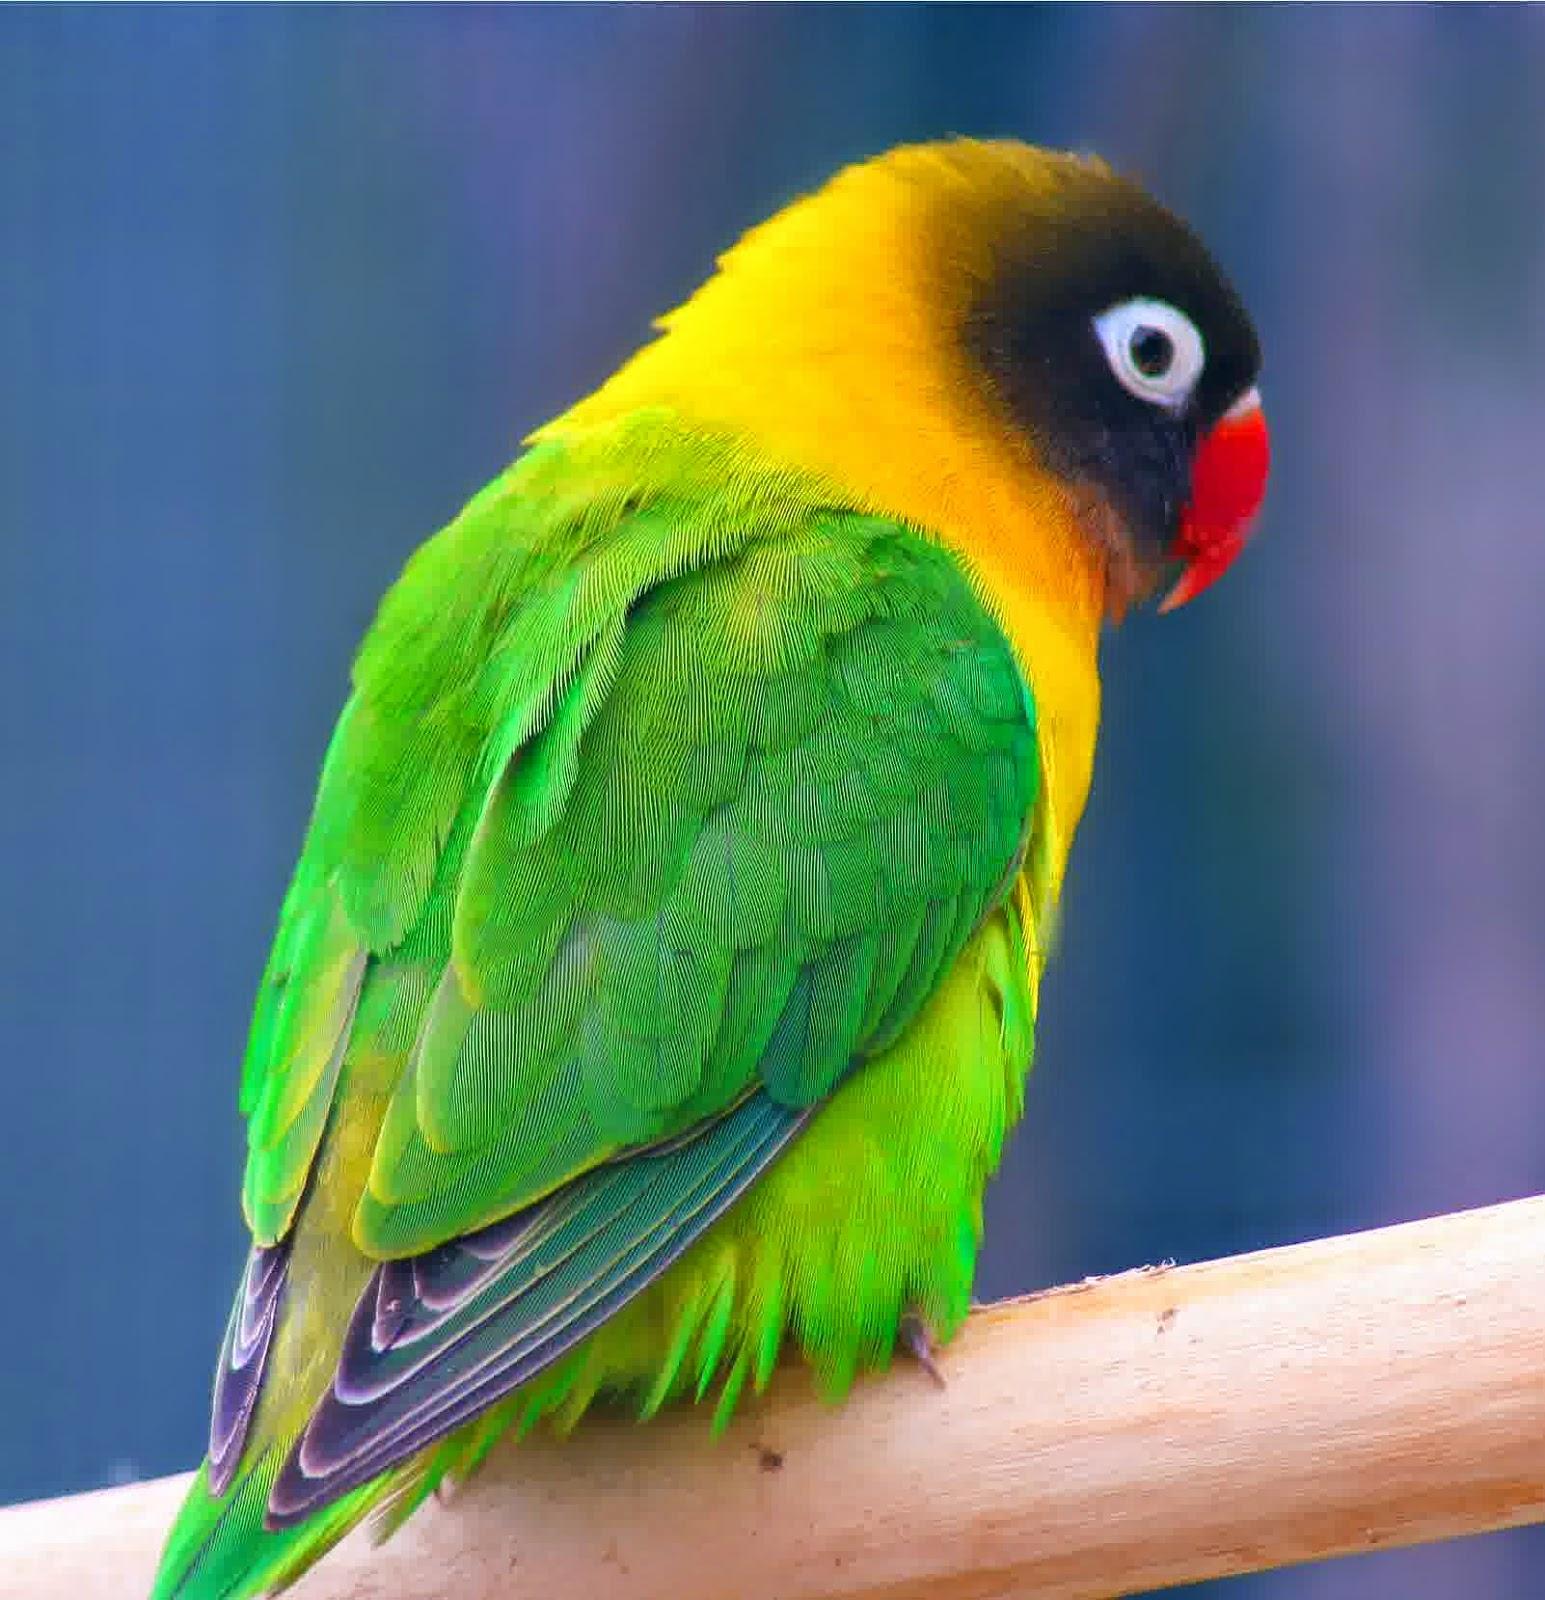 om hoby gambar jenis burung love bird